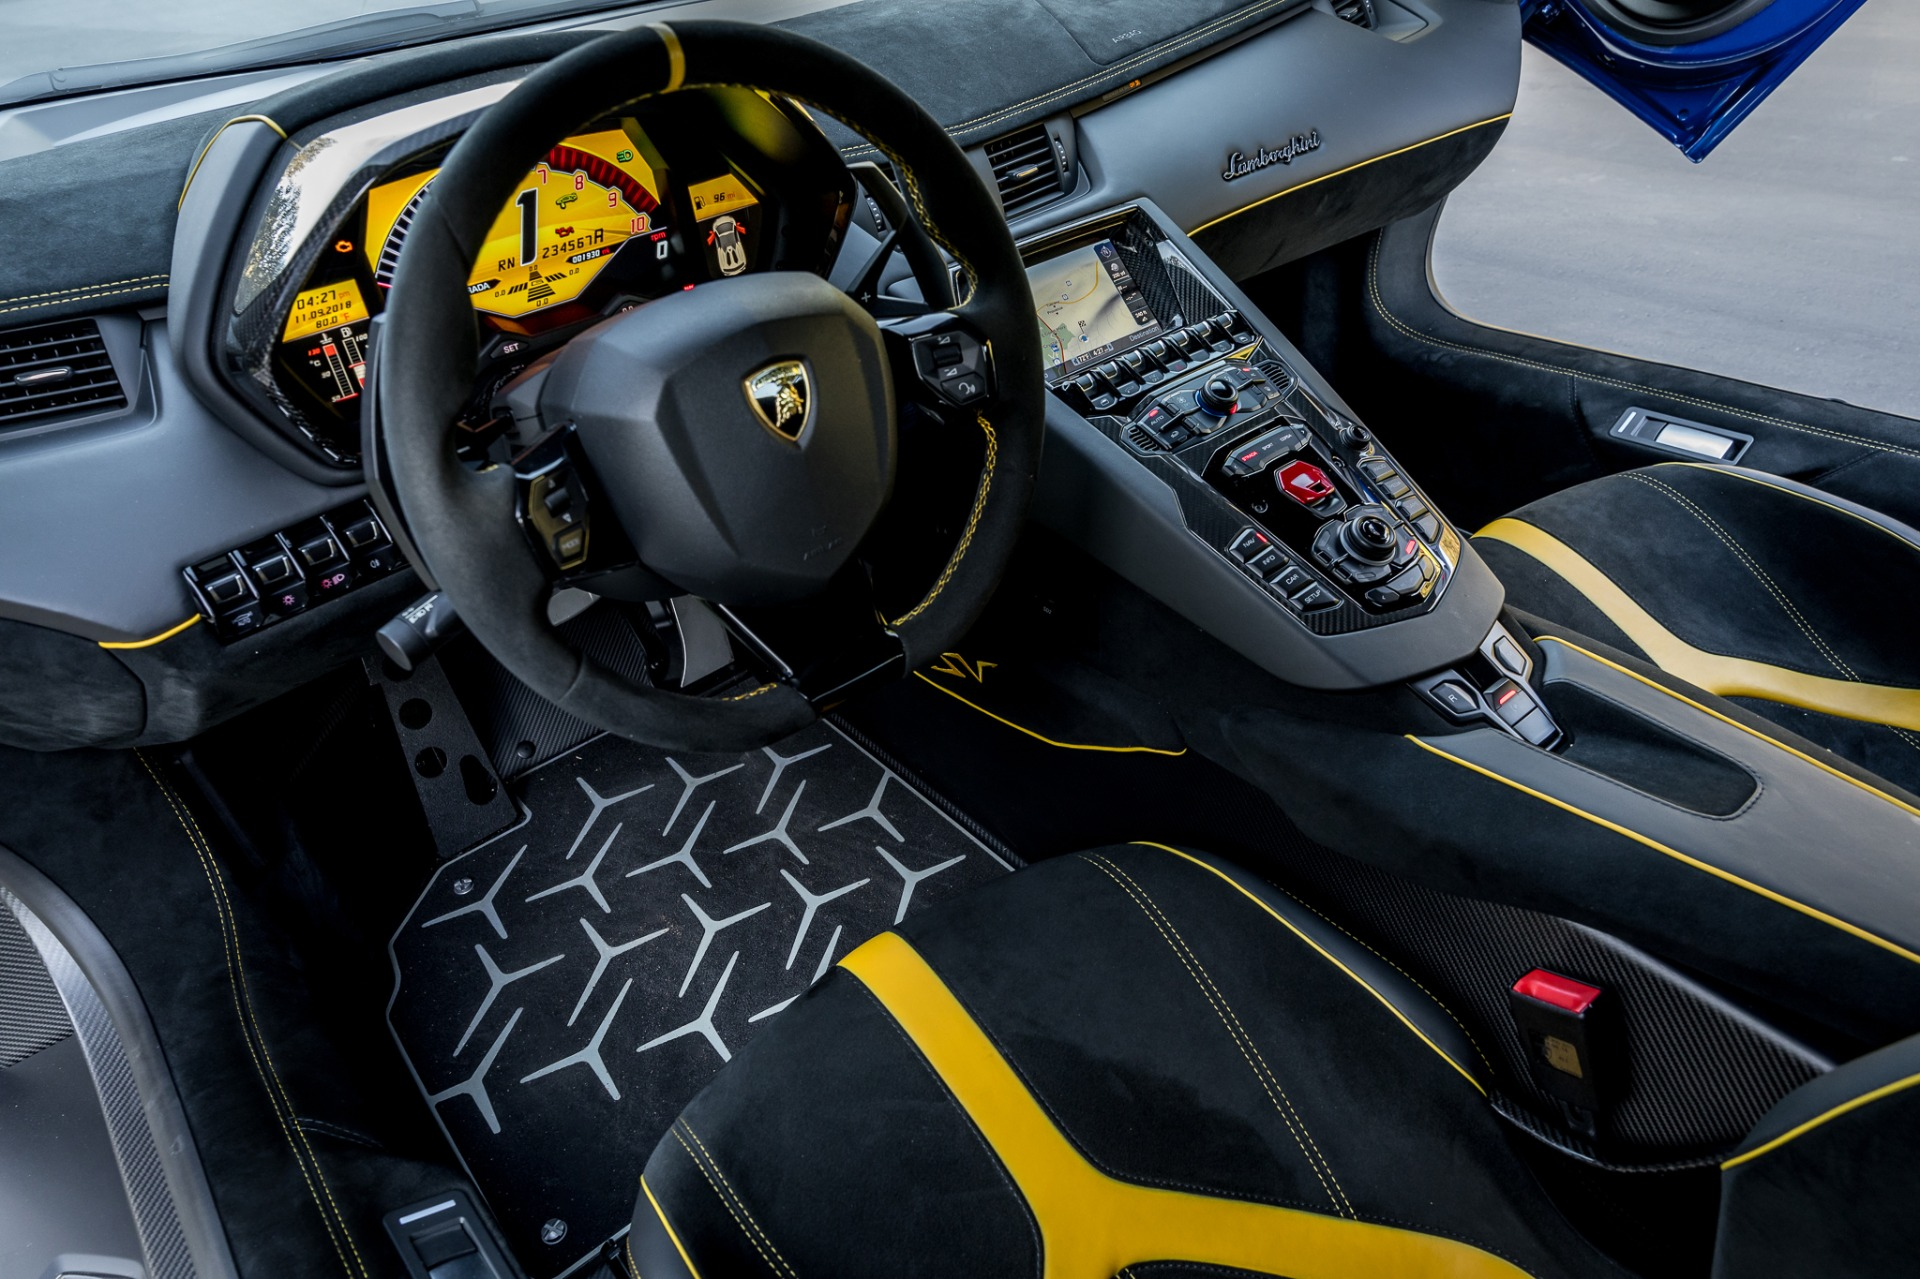 Used 2017 Lamborghini Aventador LP 750-4 SV / 740HP / AWD / 1930 MI / NAV / CAMERA for sale Sold at Formula Imports in Charlotte NC 28227 53